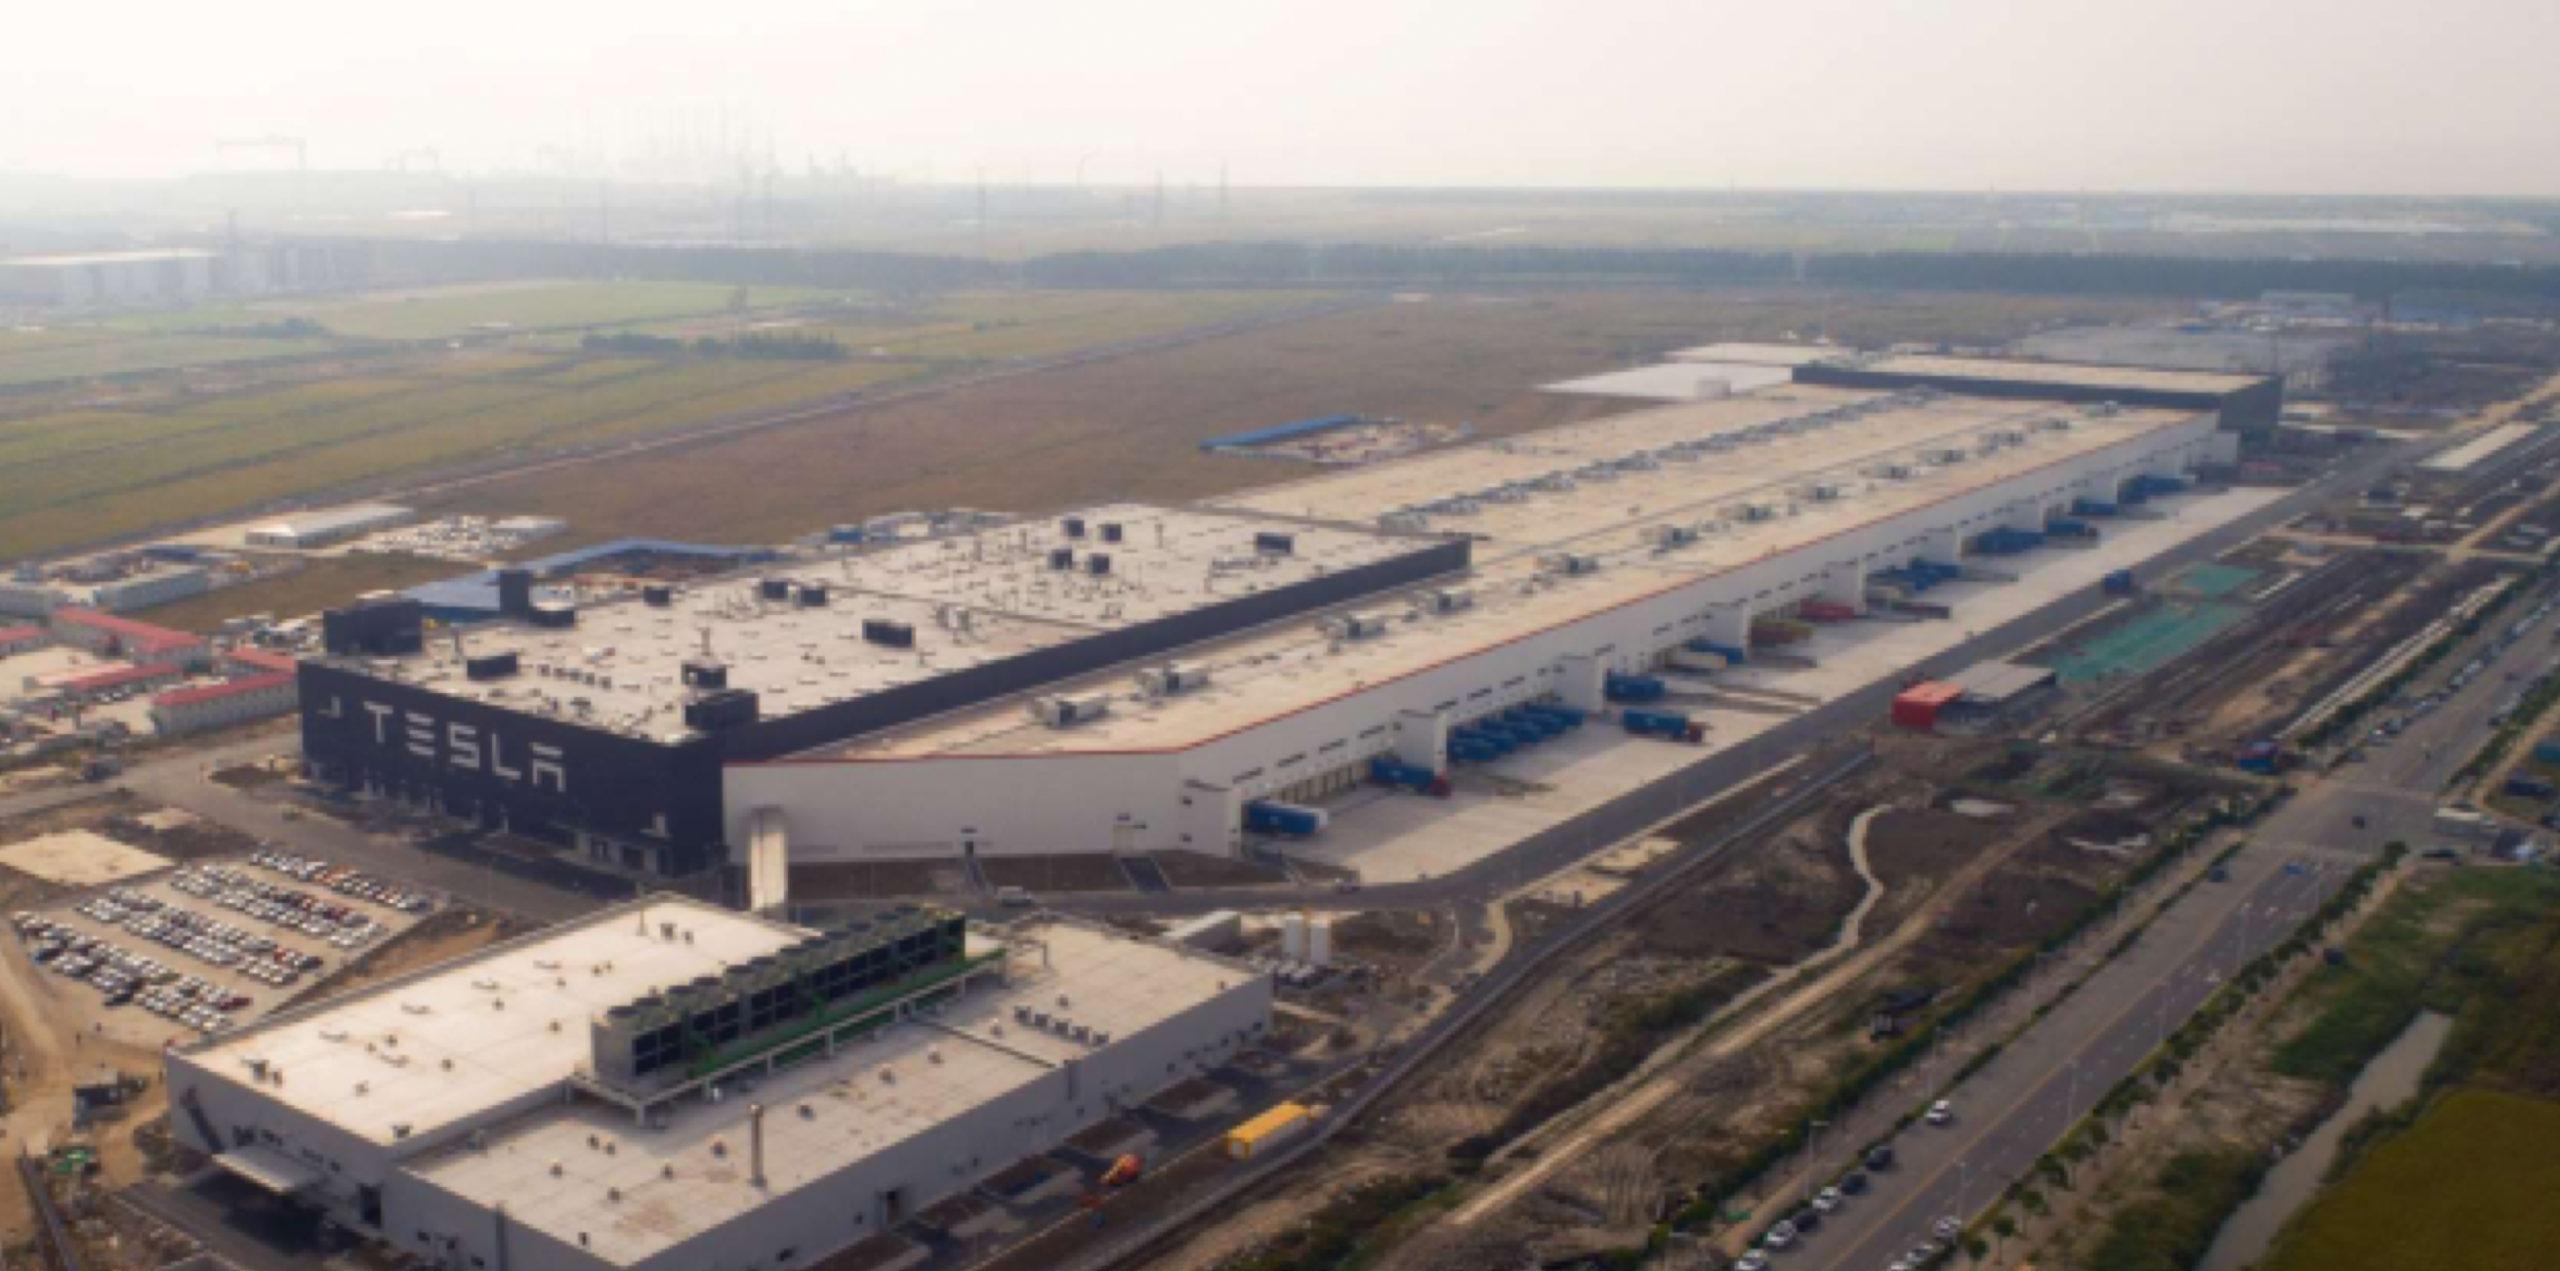 Tesla's Giga 3 Shanghai factory